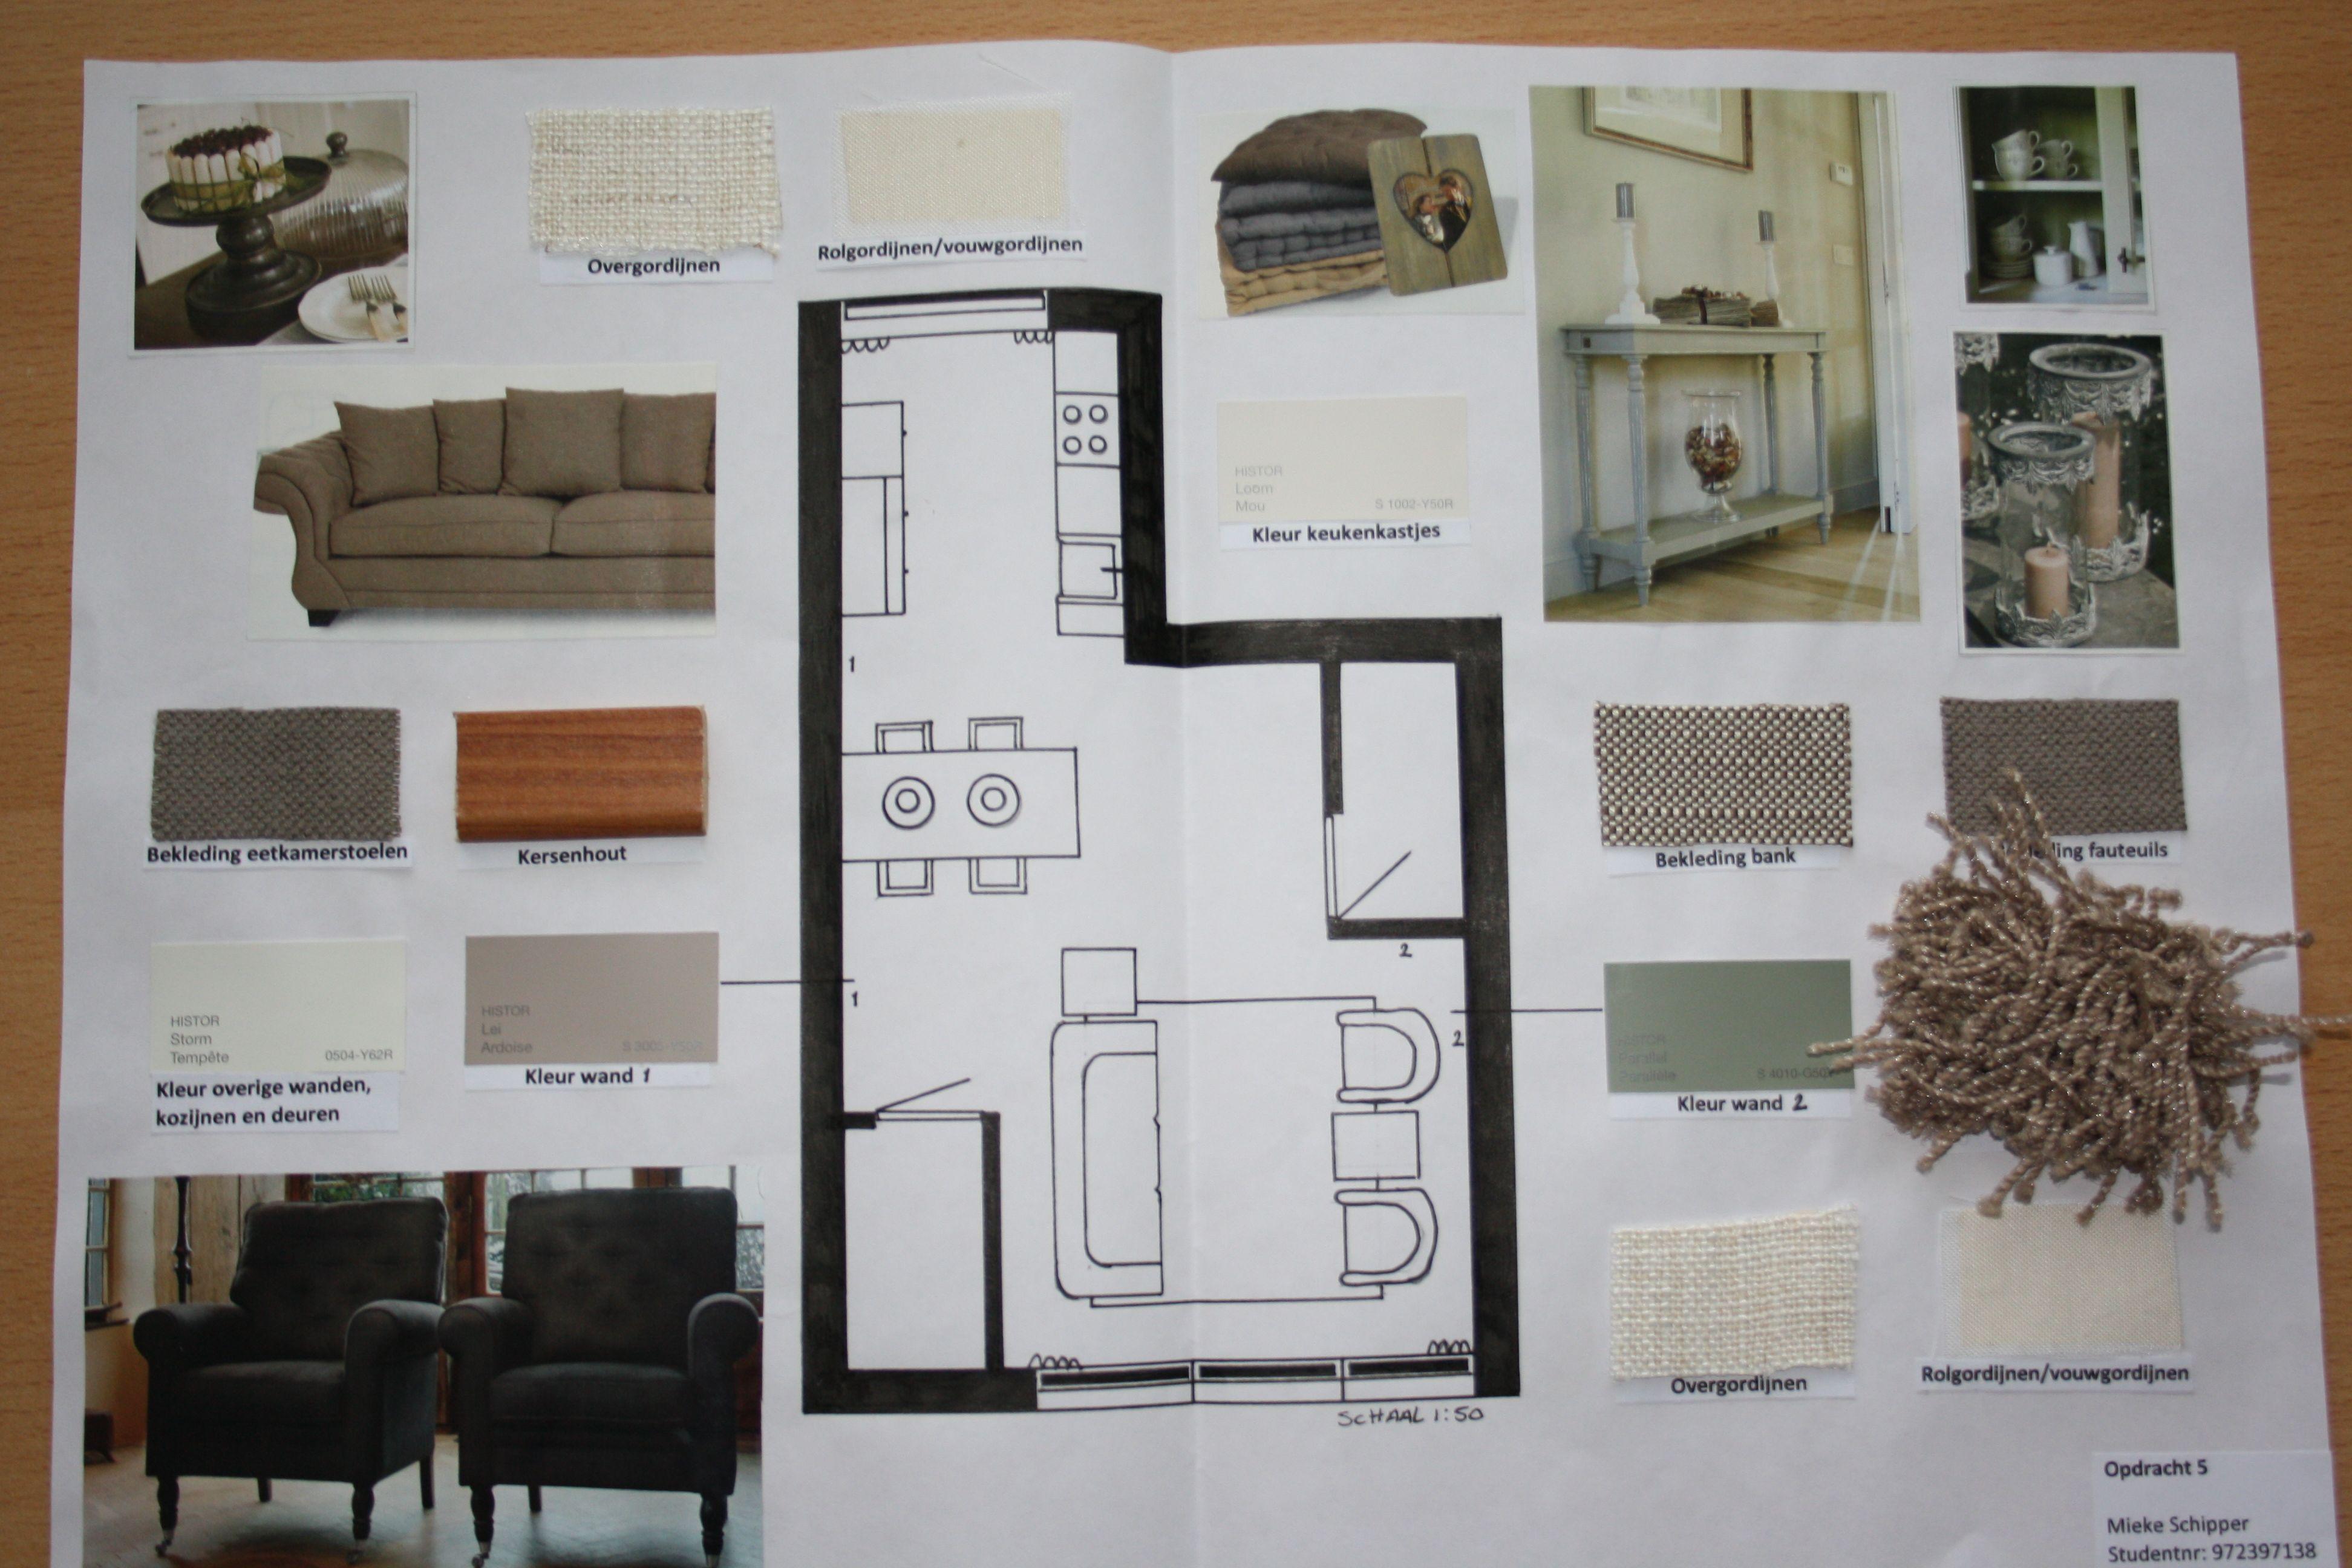 1000+ images about Kleuren- en materialenplan on Pinterest ...